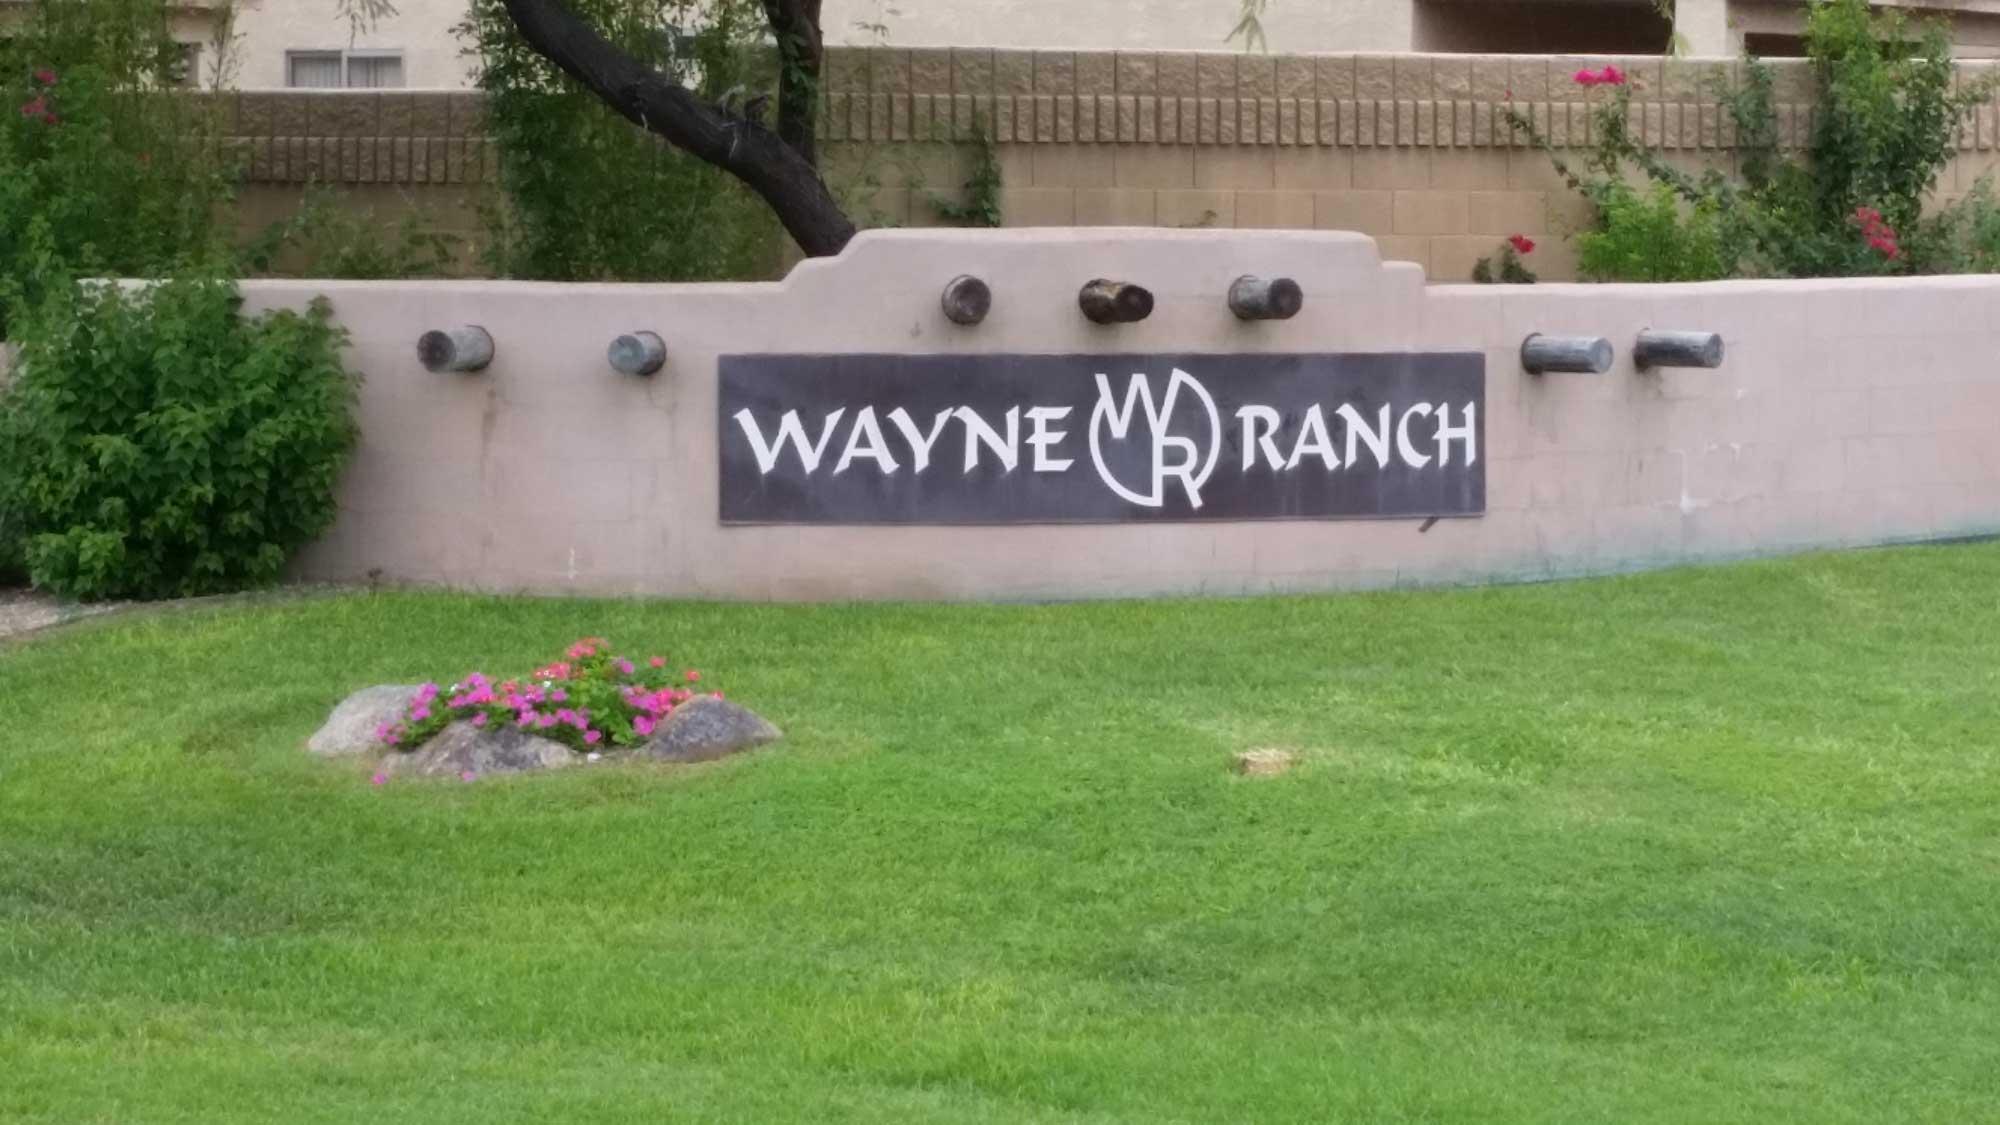 Wayne Ranch (2)